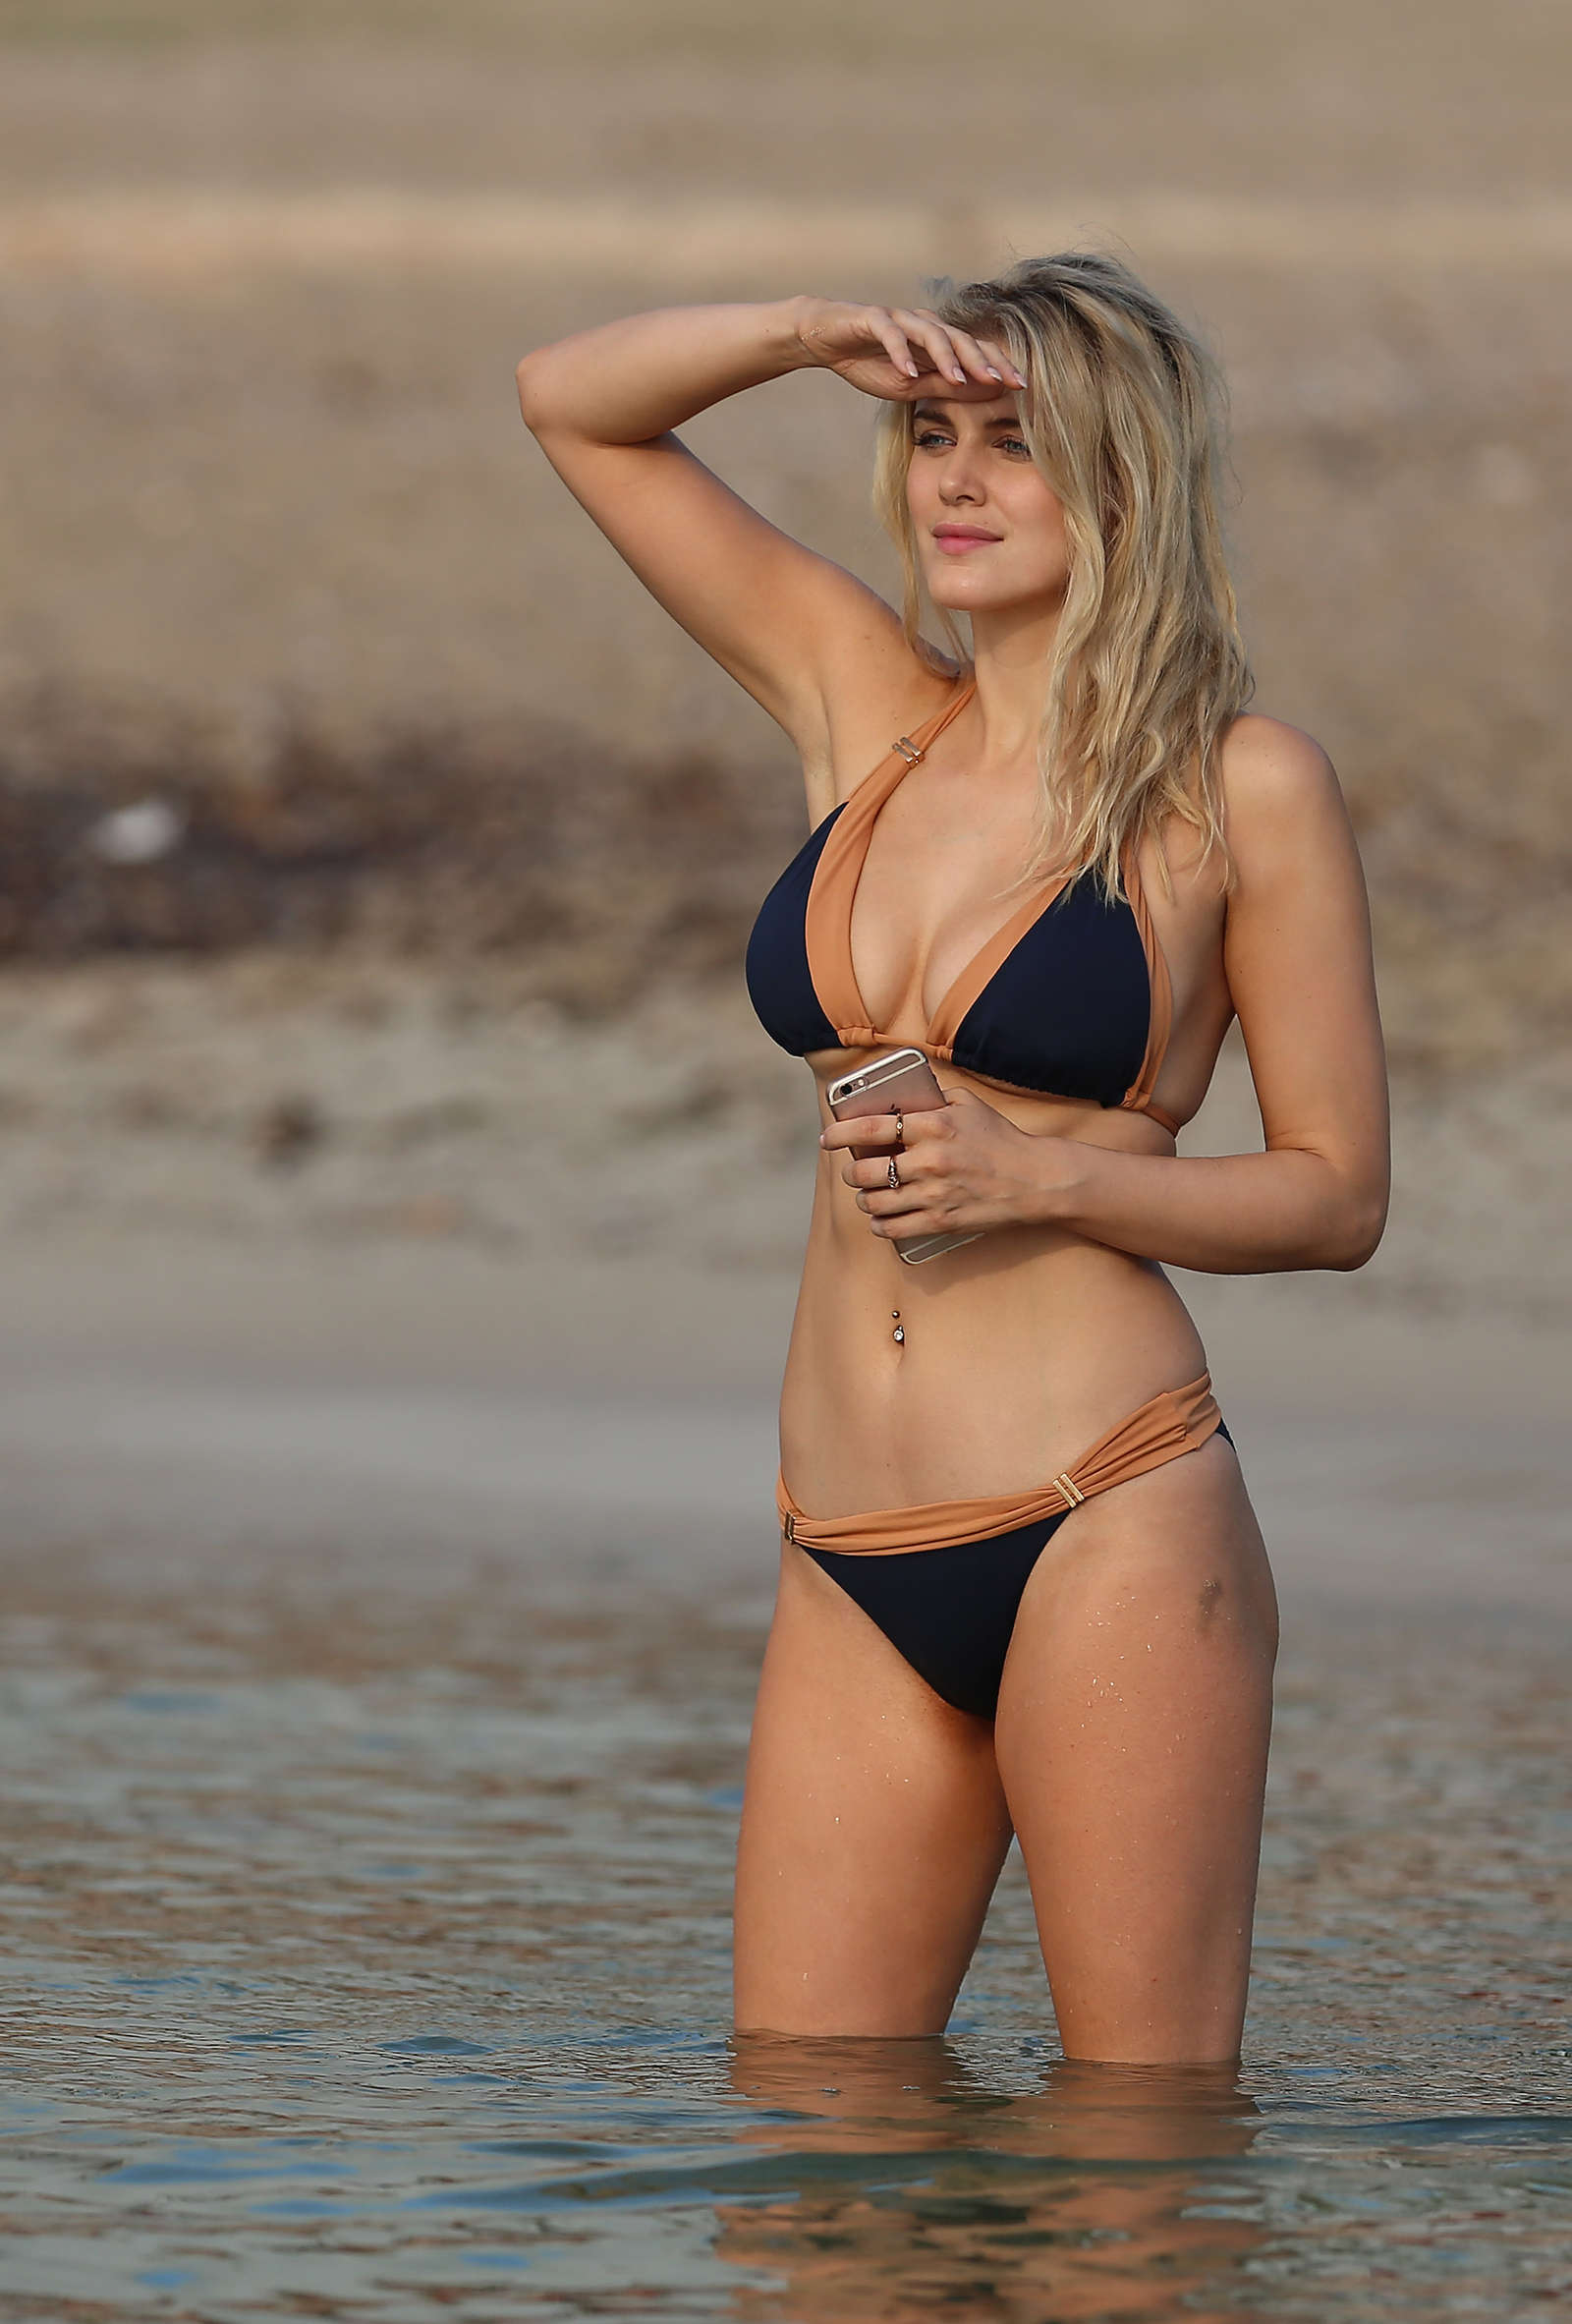 Watch Isabelle Boemeke Nude - 9 Photos video